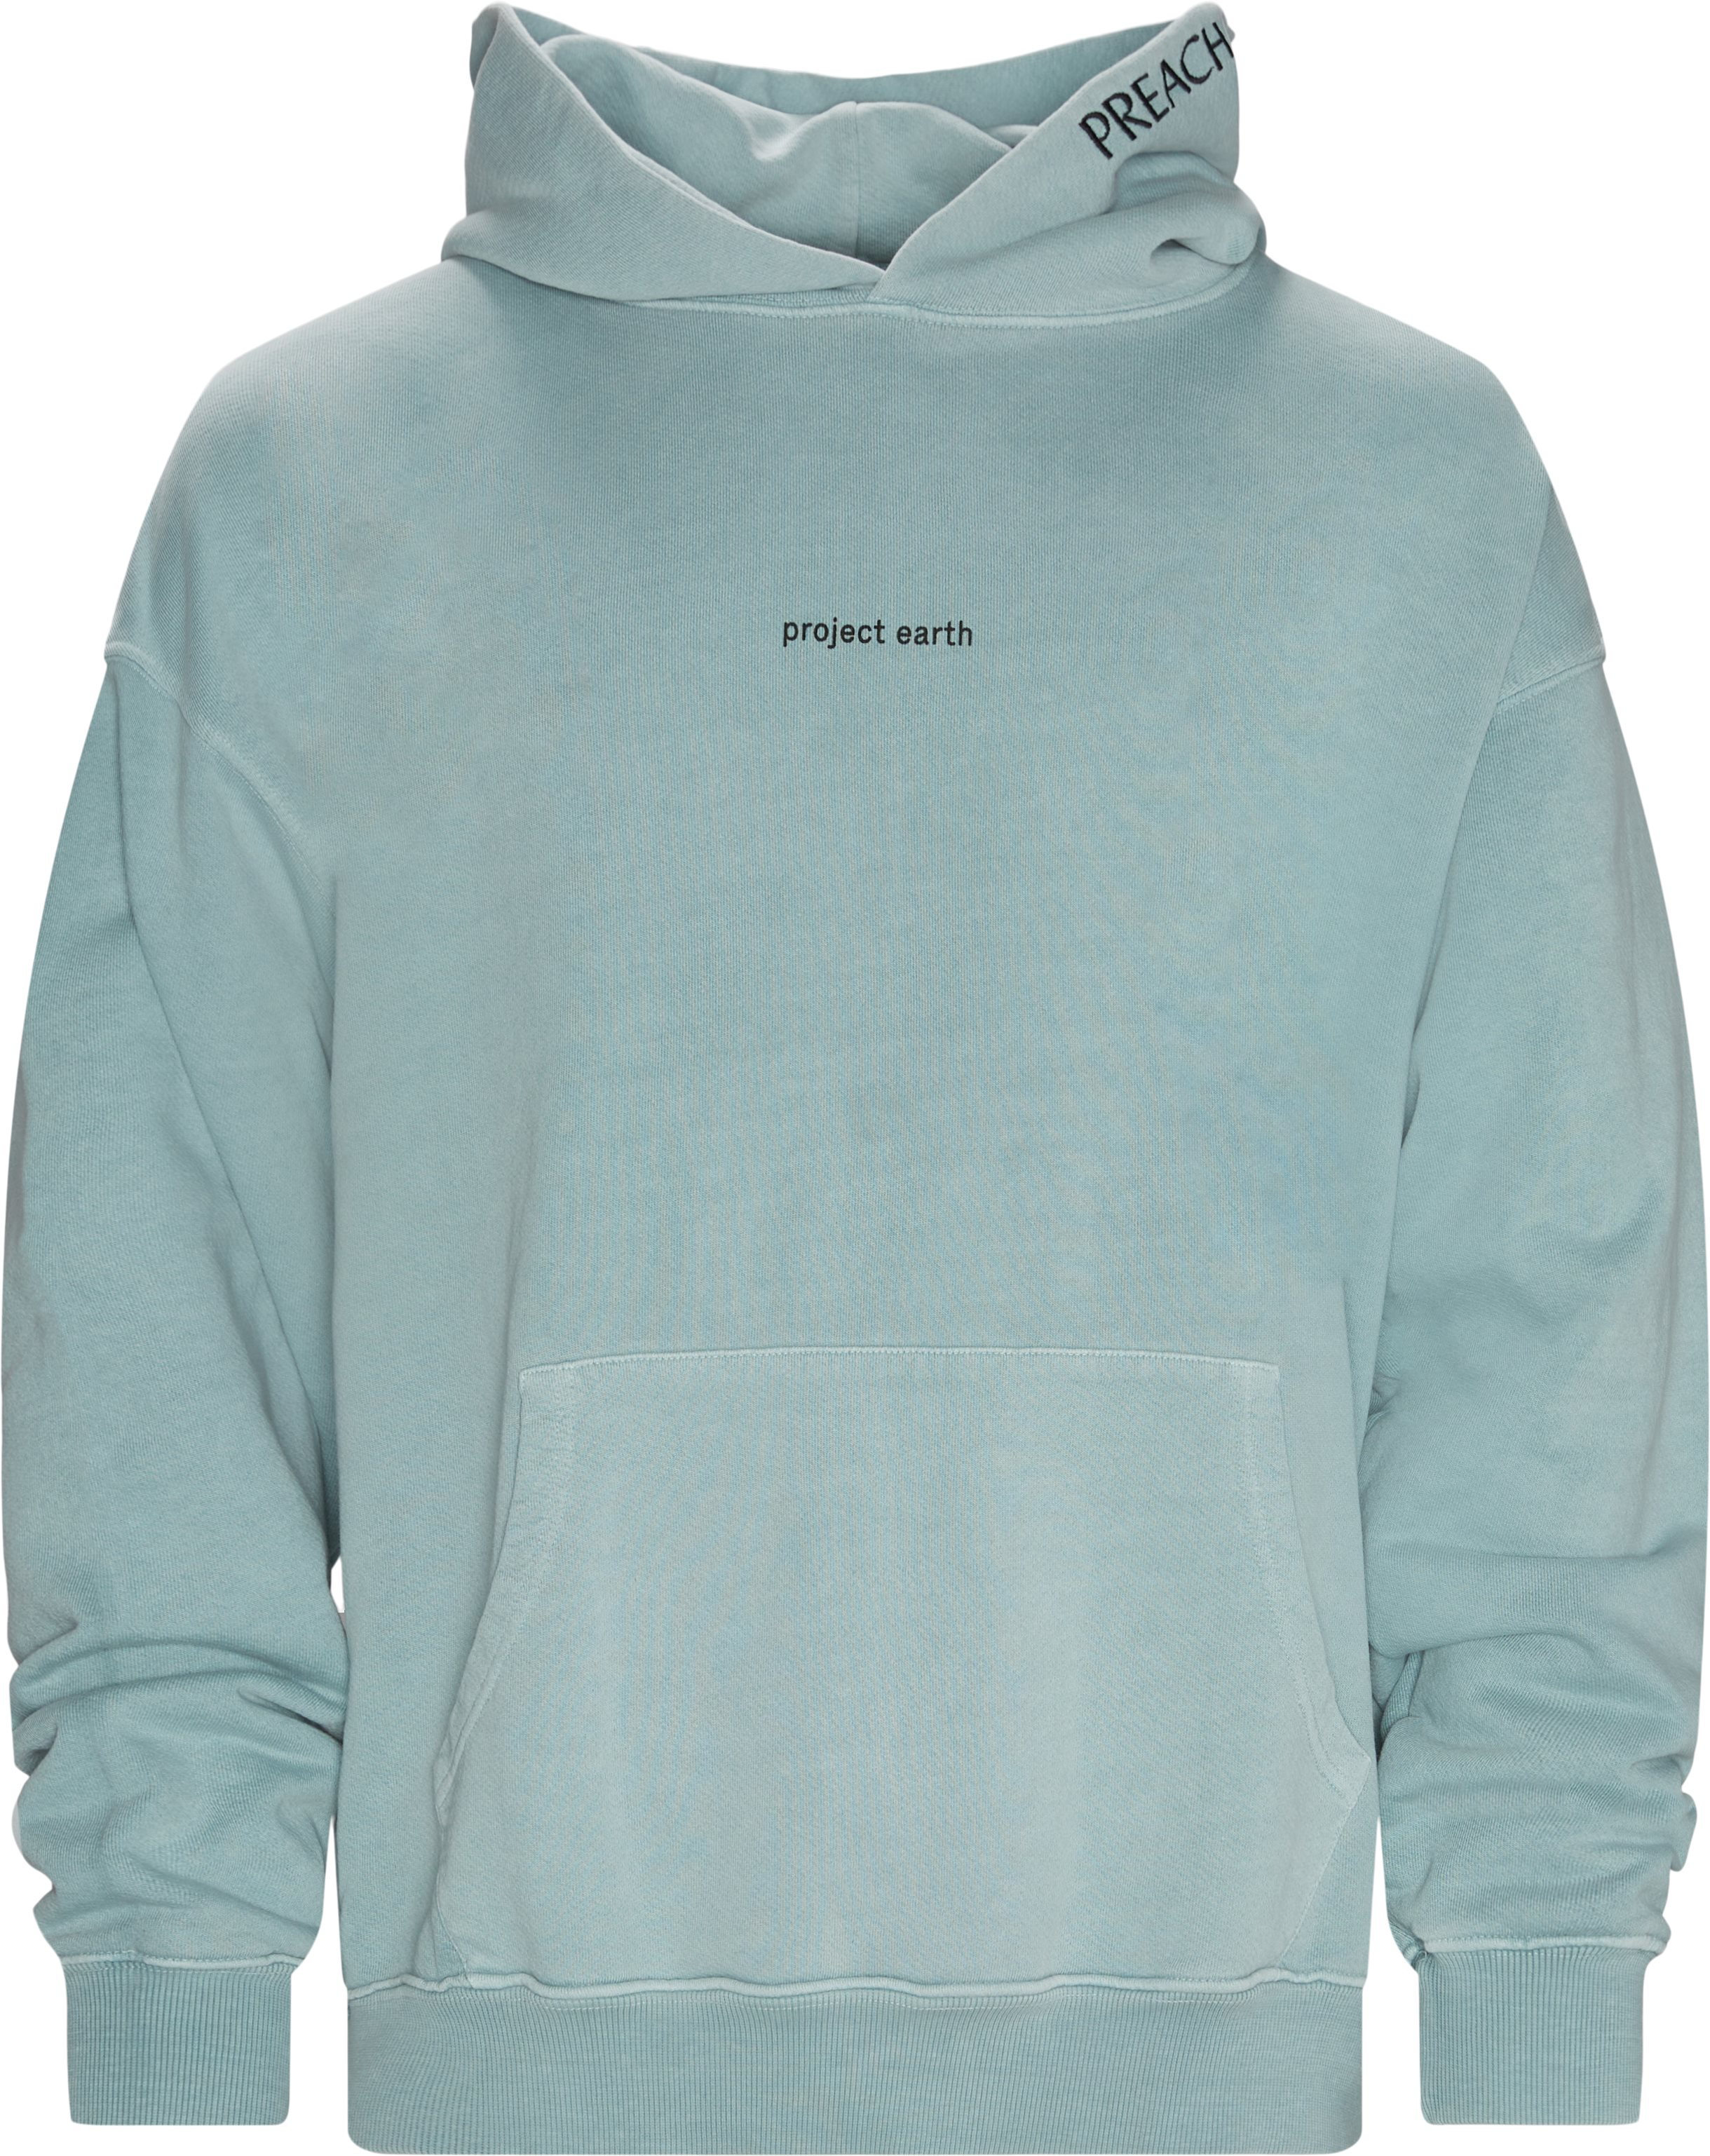 Oversized project earth hoodie - Sweatshirts - Oversize fit - Turkis